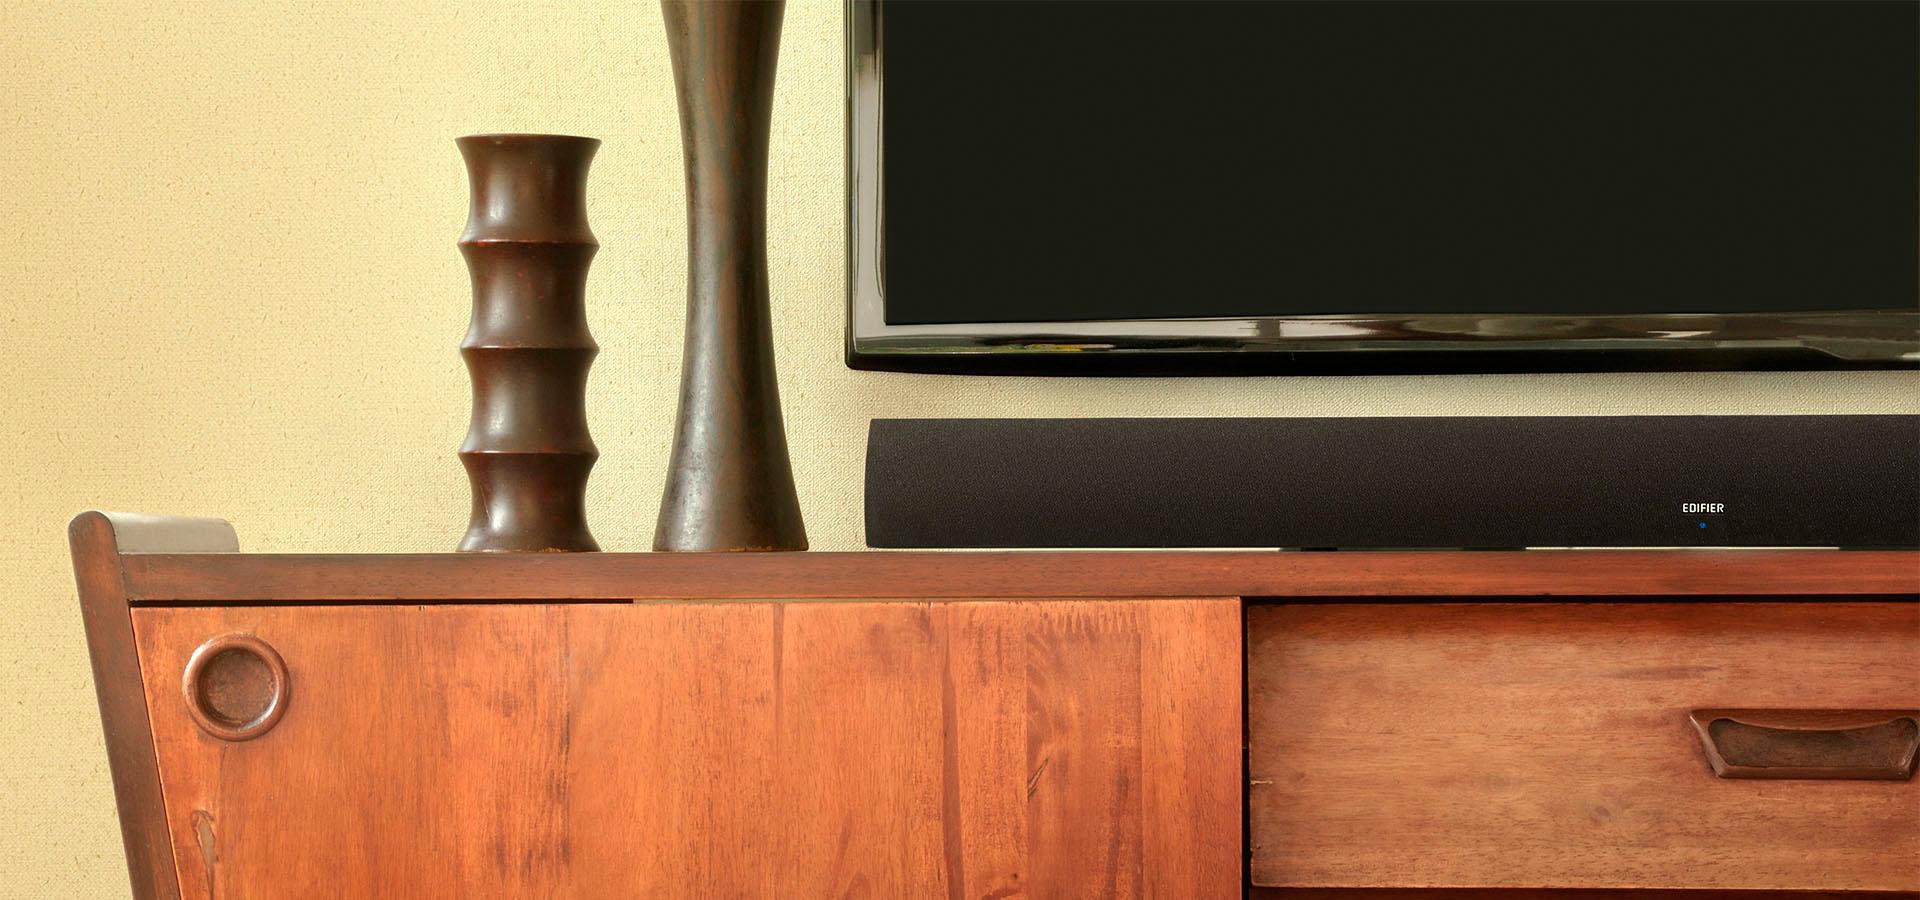 B3 Sound Bar Perfect Soundbar For Your Tv Edifier